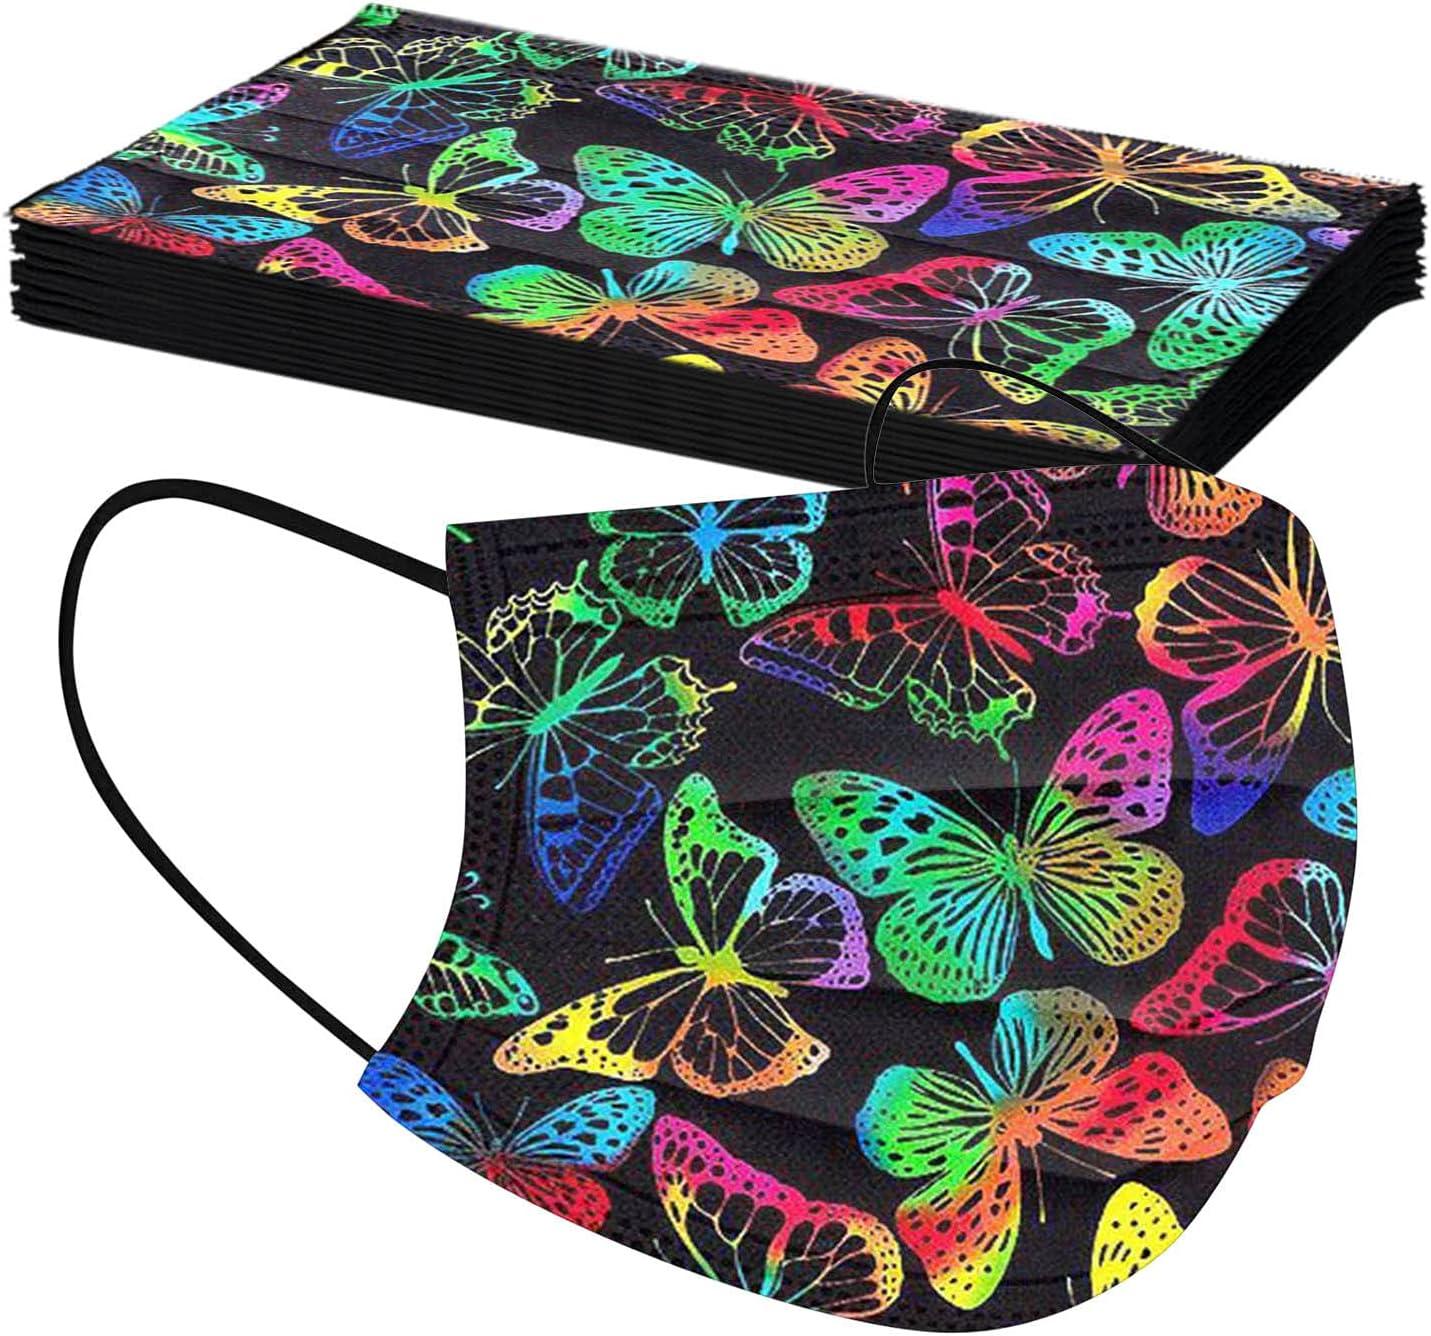 Women's Black Face Bandanas Brand Cheap Sale Max 75% OFF Venue Colorful Fashi Print Butterfly